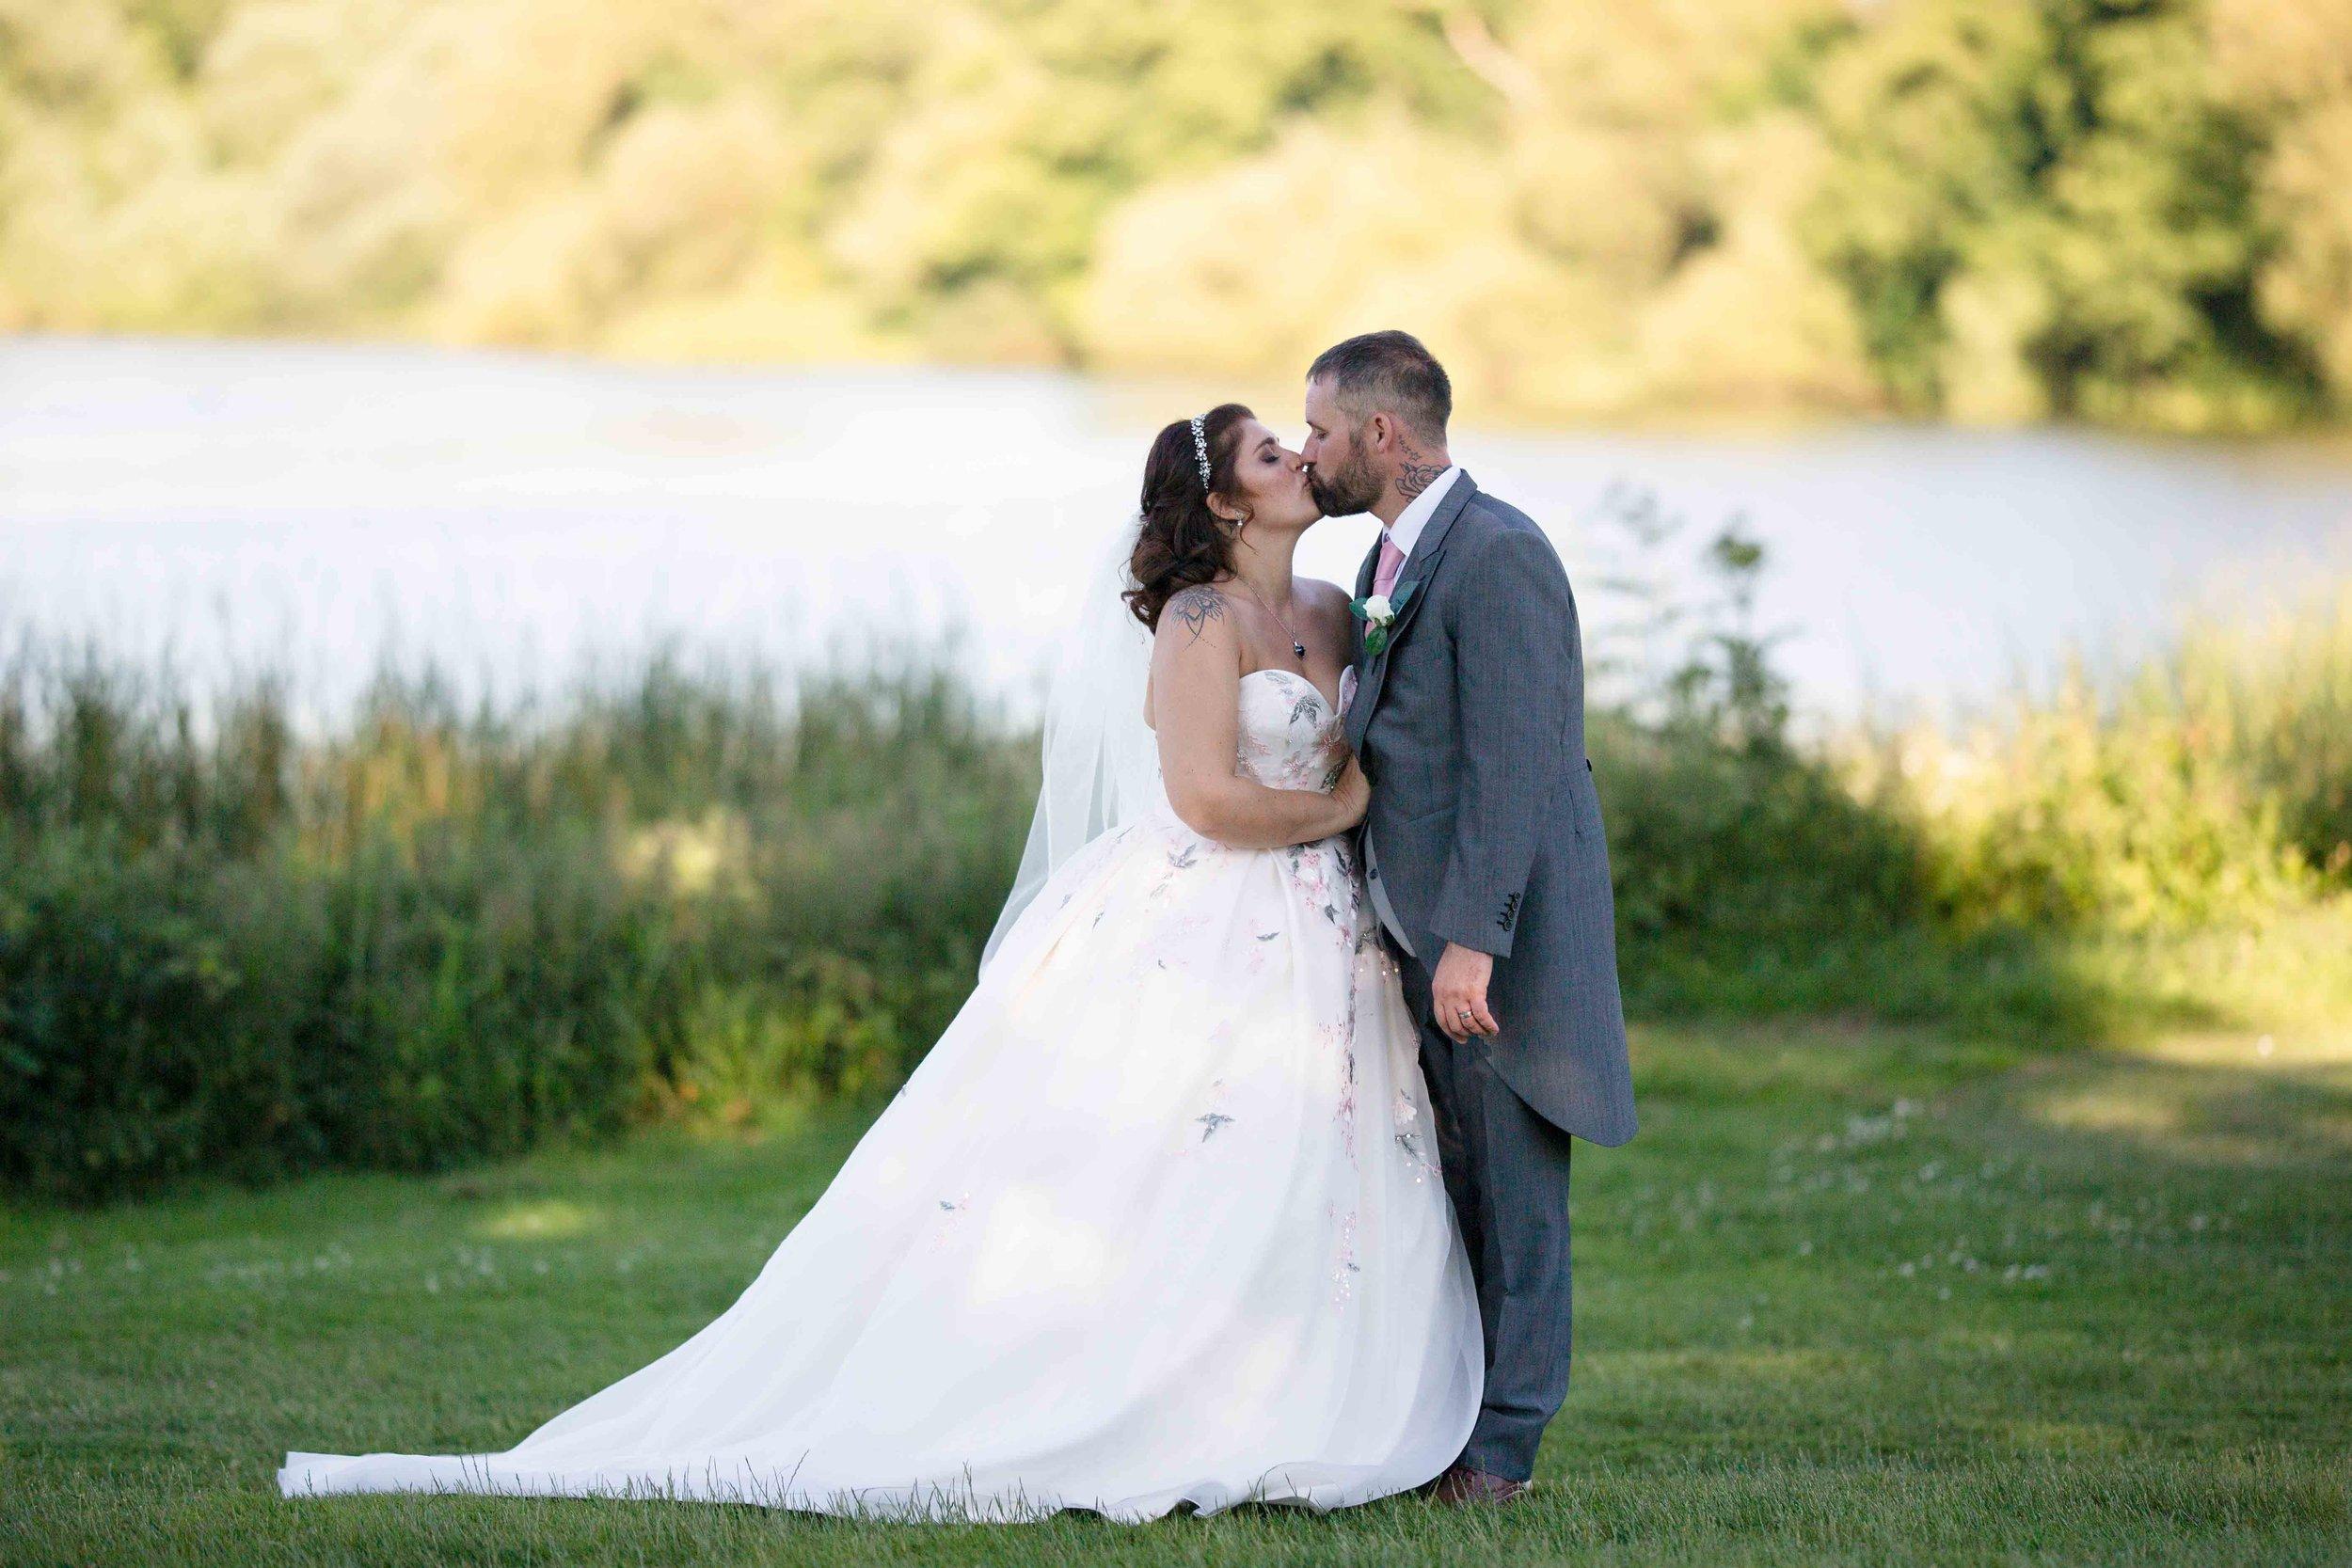 Lea-cooper-photography-wedding-photography-wolverhampton-patshull-park-hotel-wedding-pattingham-wolverhampton-west-midlands-uk-29.JPG